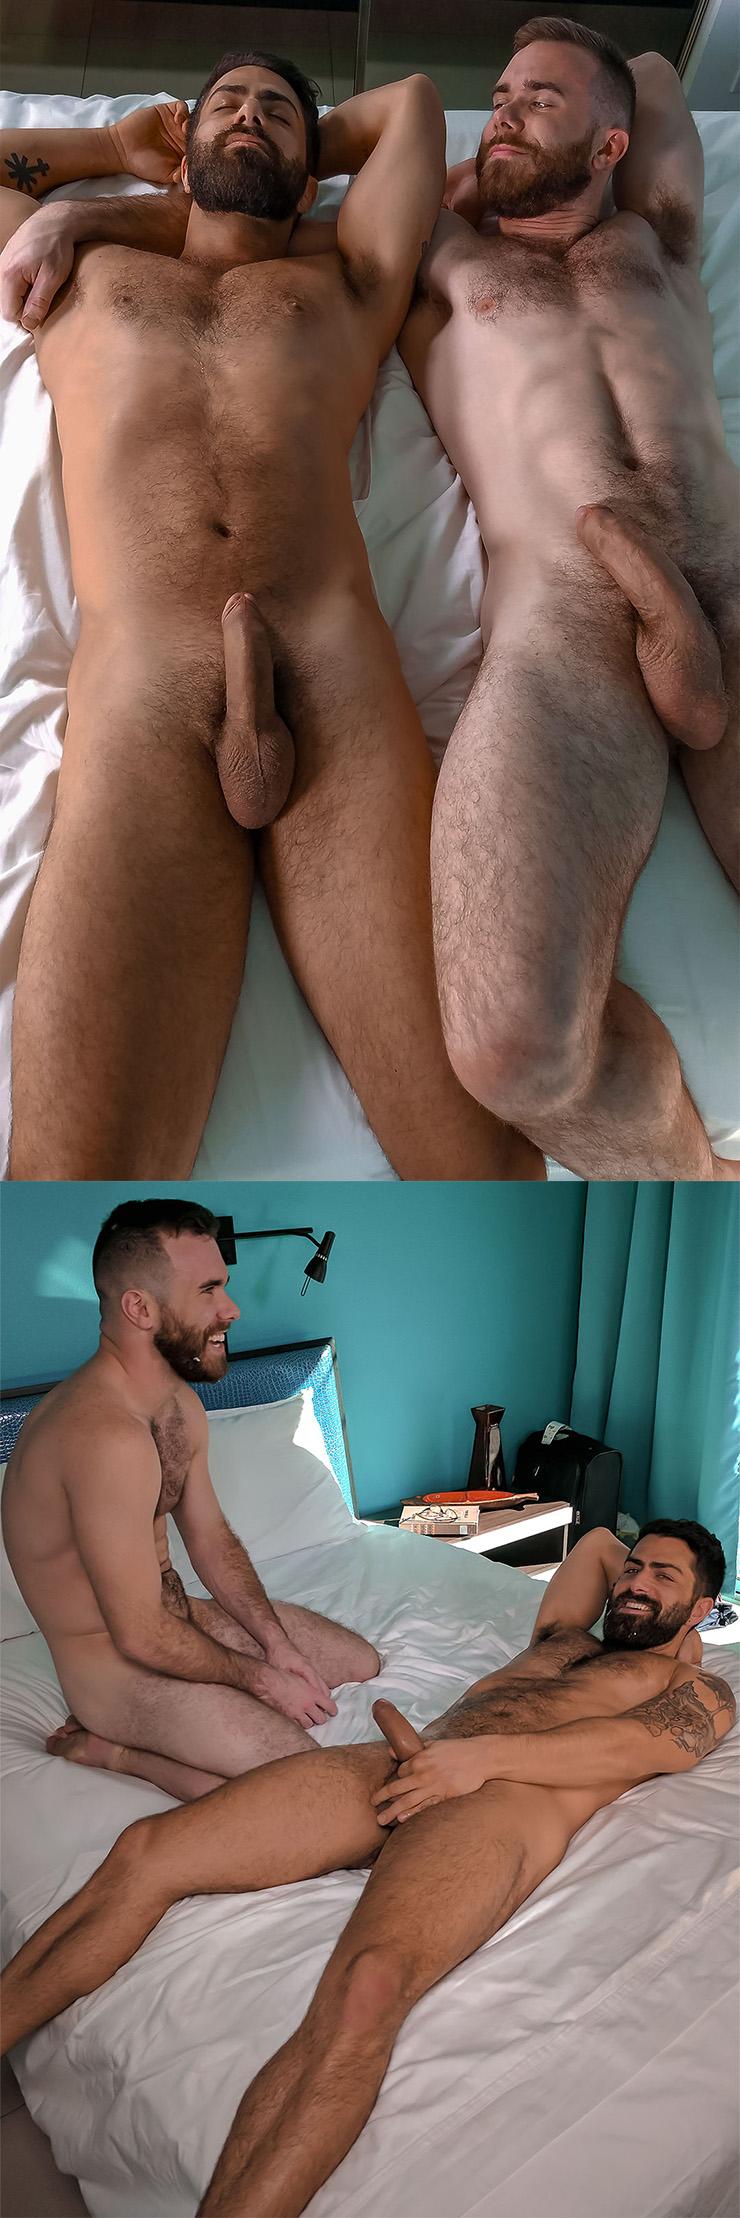 TitanMen Swap Scene 1 Matthew Bosch Fucks Adam Ramzi Gay Condom Sex Huge Uncut Cock Closeup Oral Sex Closeup Male Feet Hairy Men Hairy Chest Legs Messy Cum Bonus